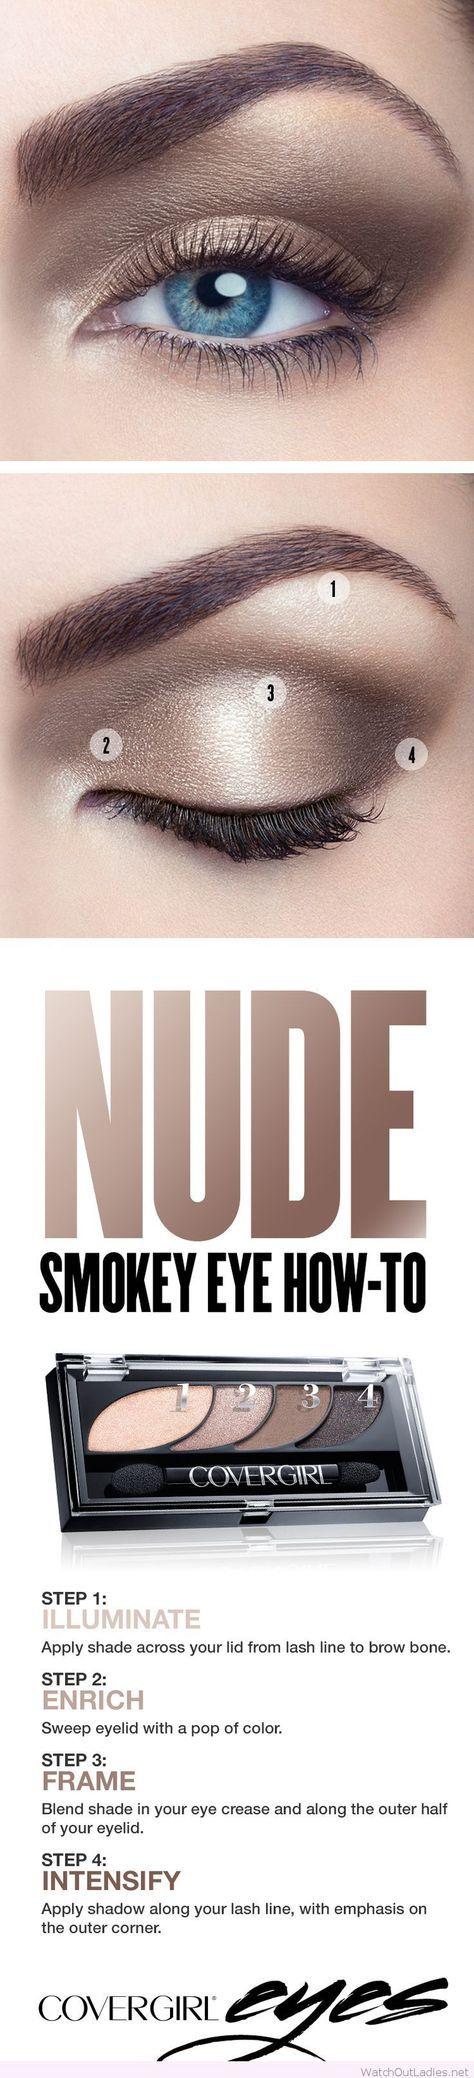 Nude smokey eye how-to tutorial step by step